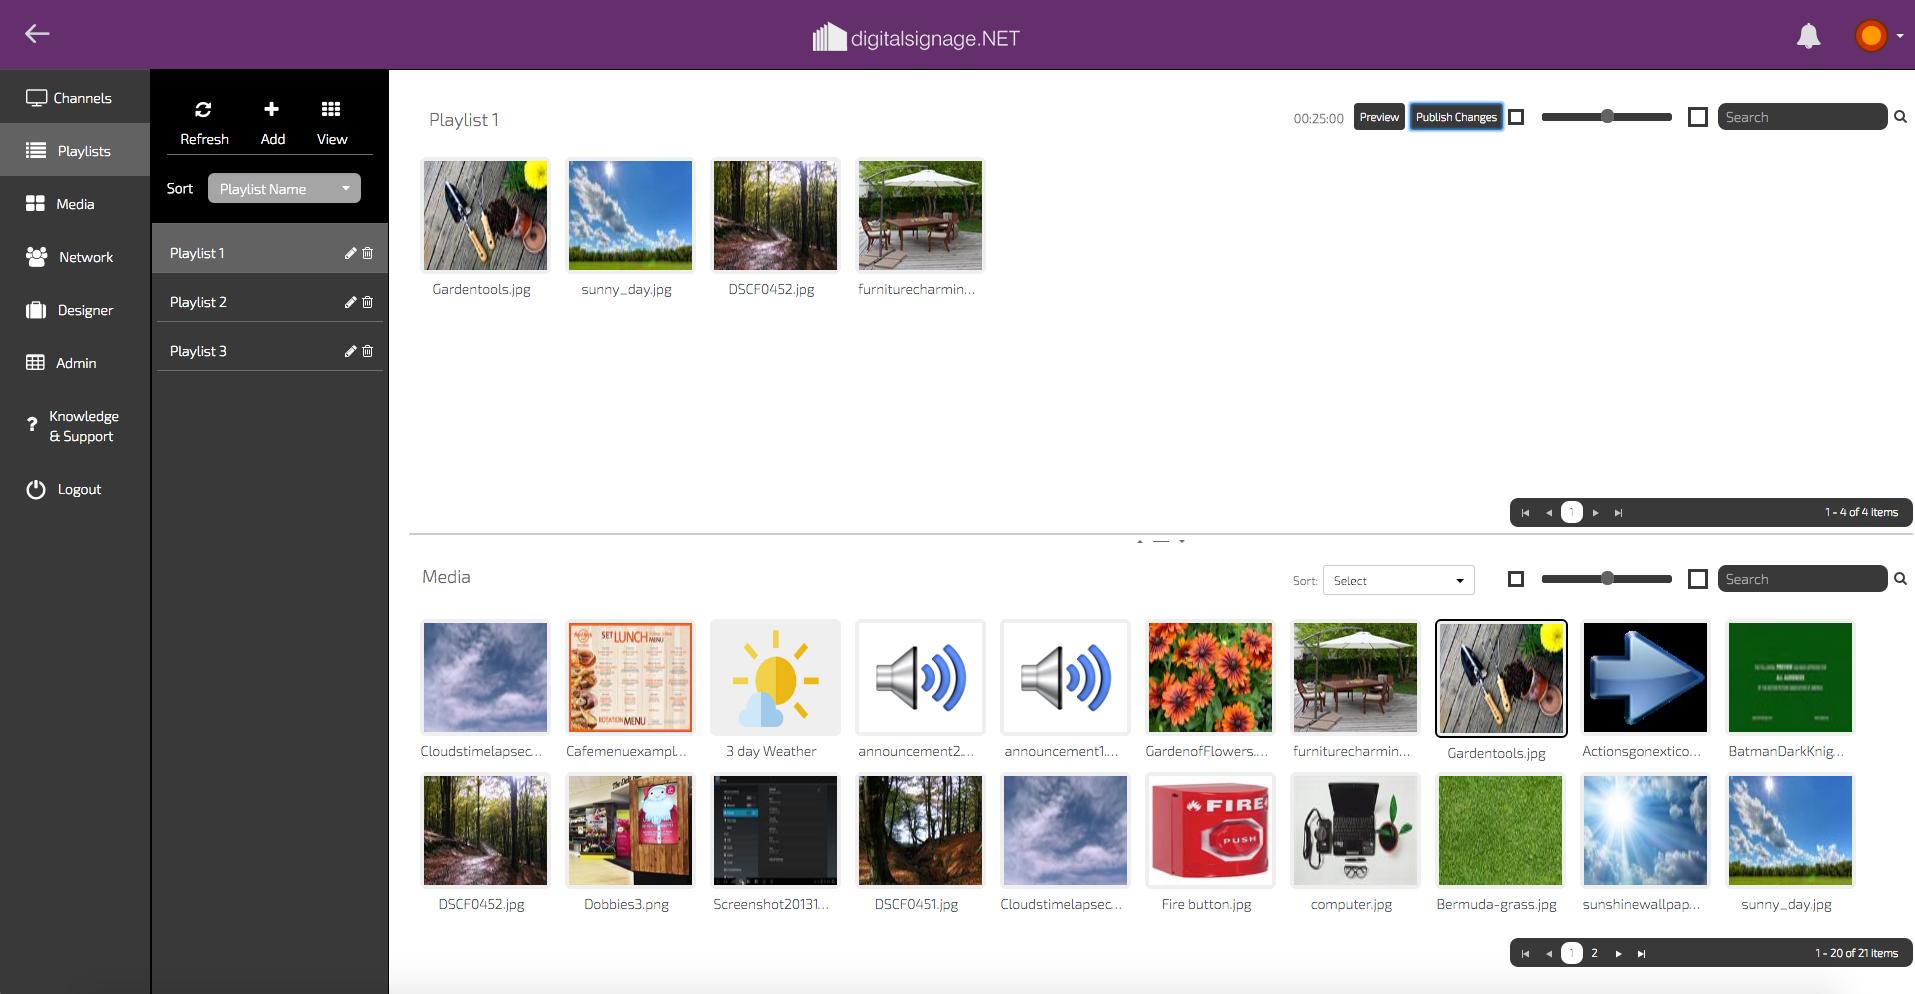 digitalsignage.net core-edition-main